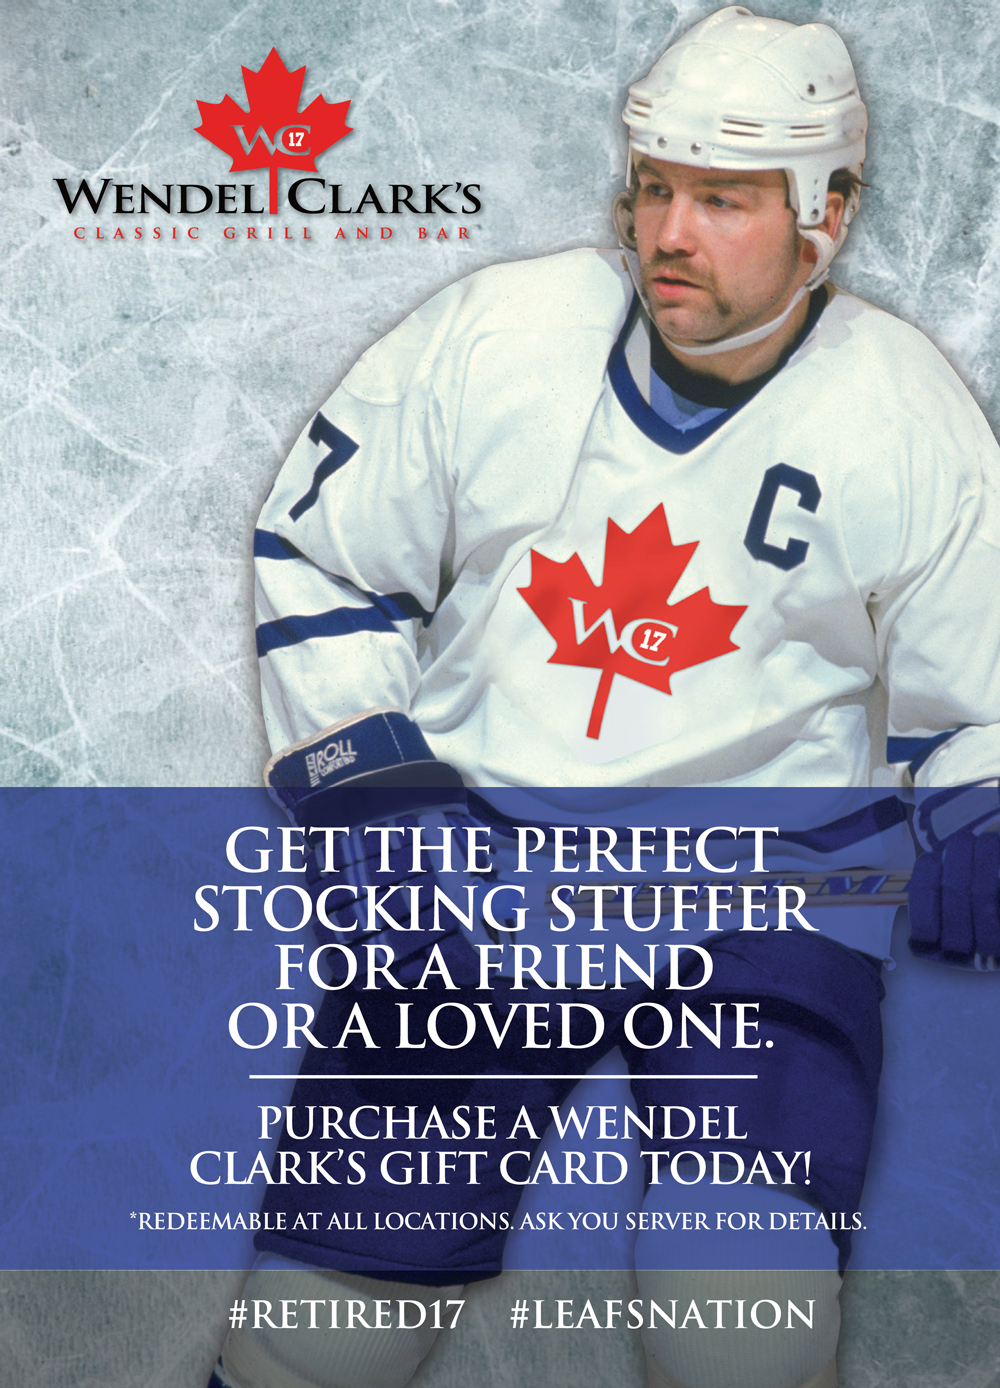 Wendel Clark's Gift Cards